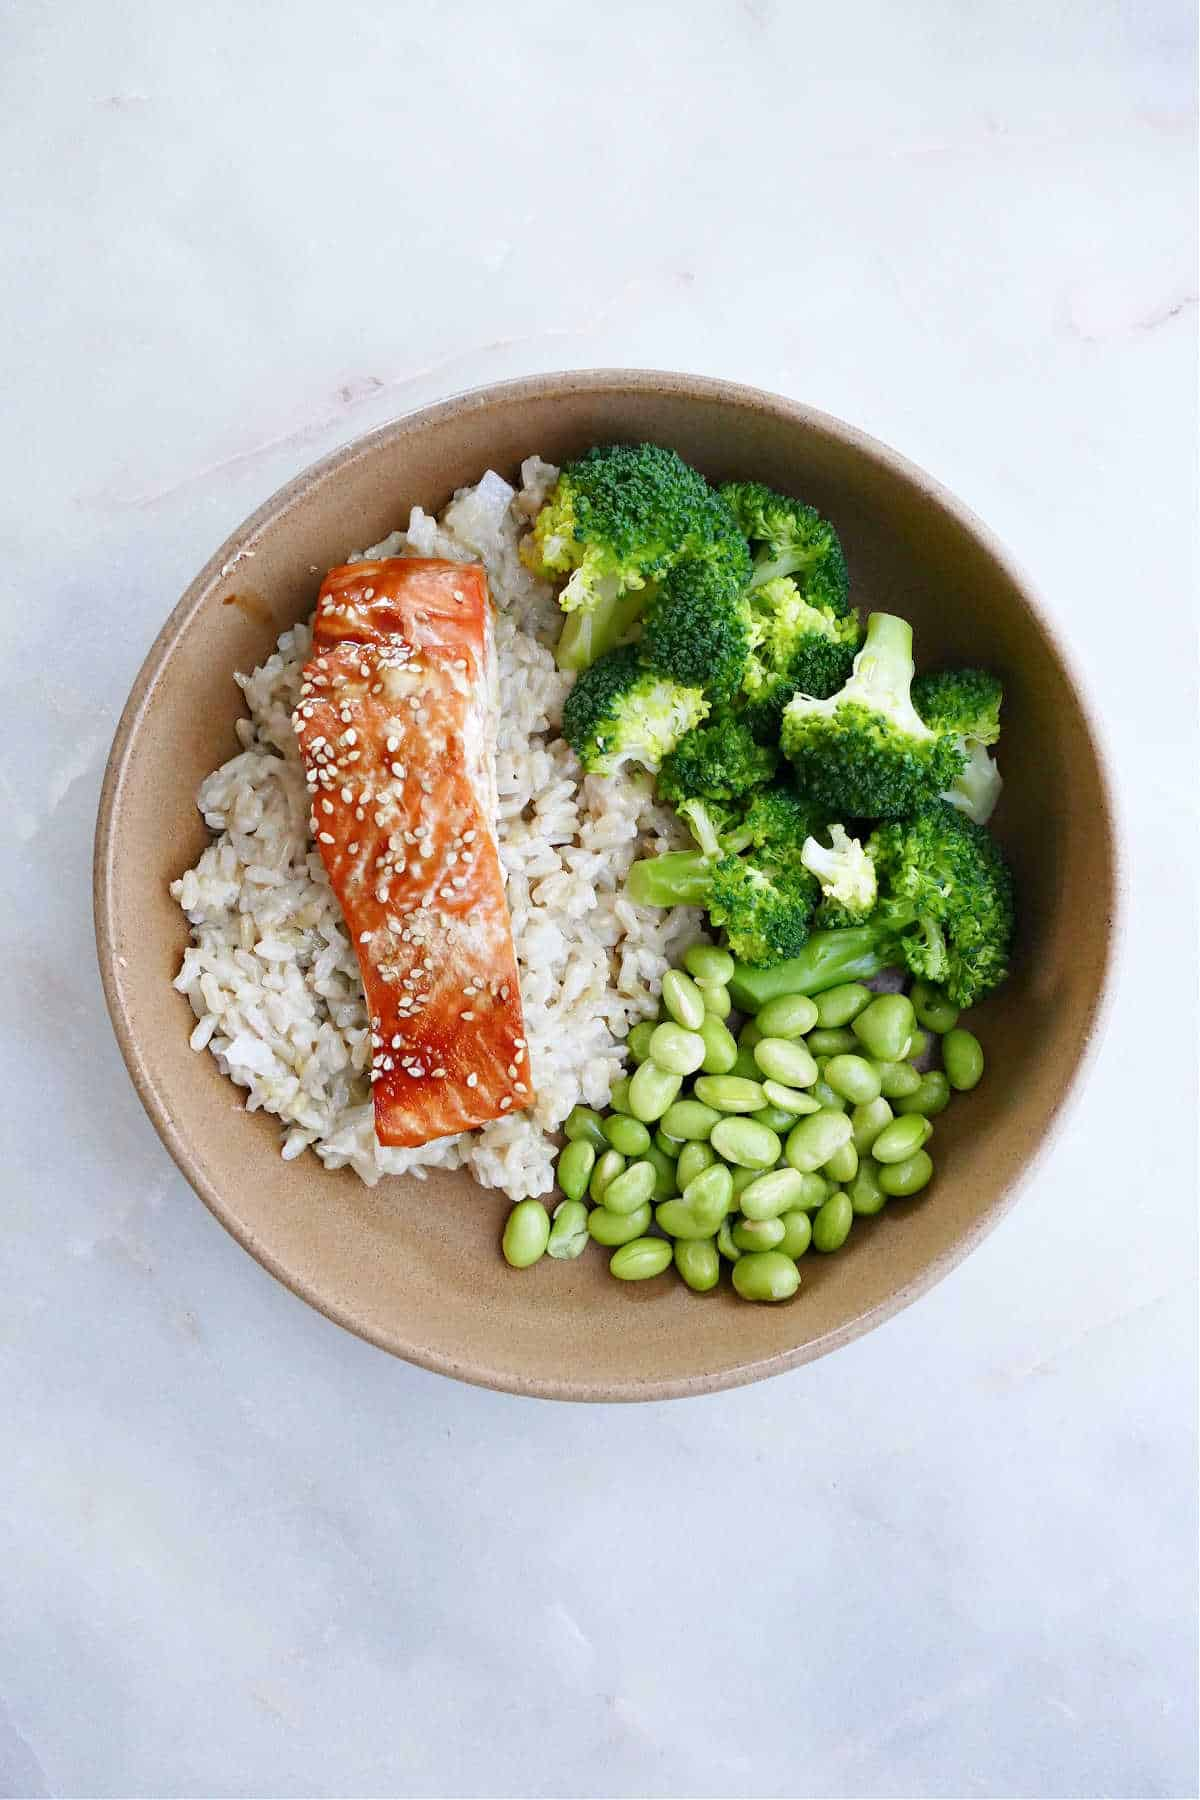 serving bowl with coconut rice, broccoli, edamame, and teriyaki salmon on a counter